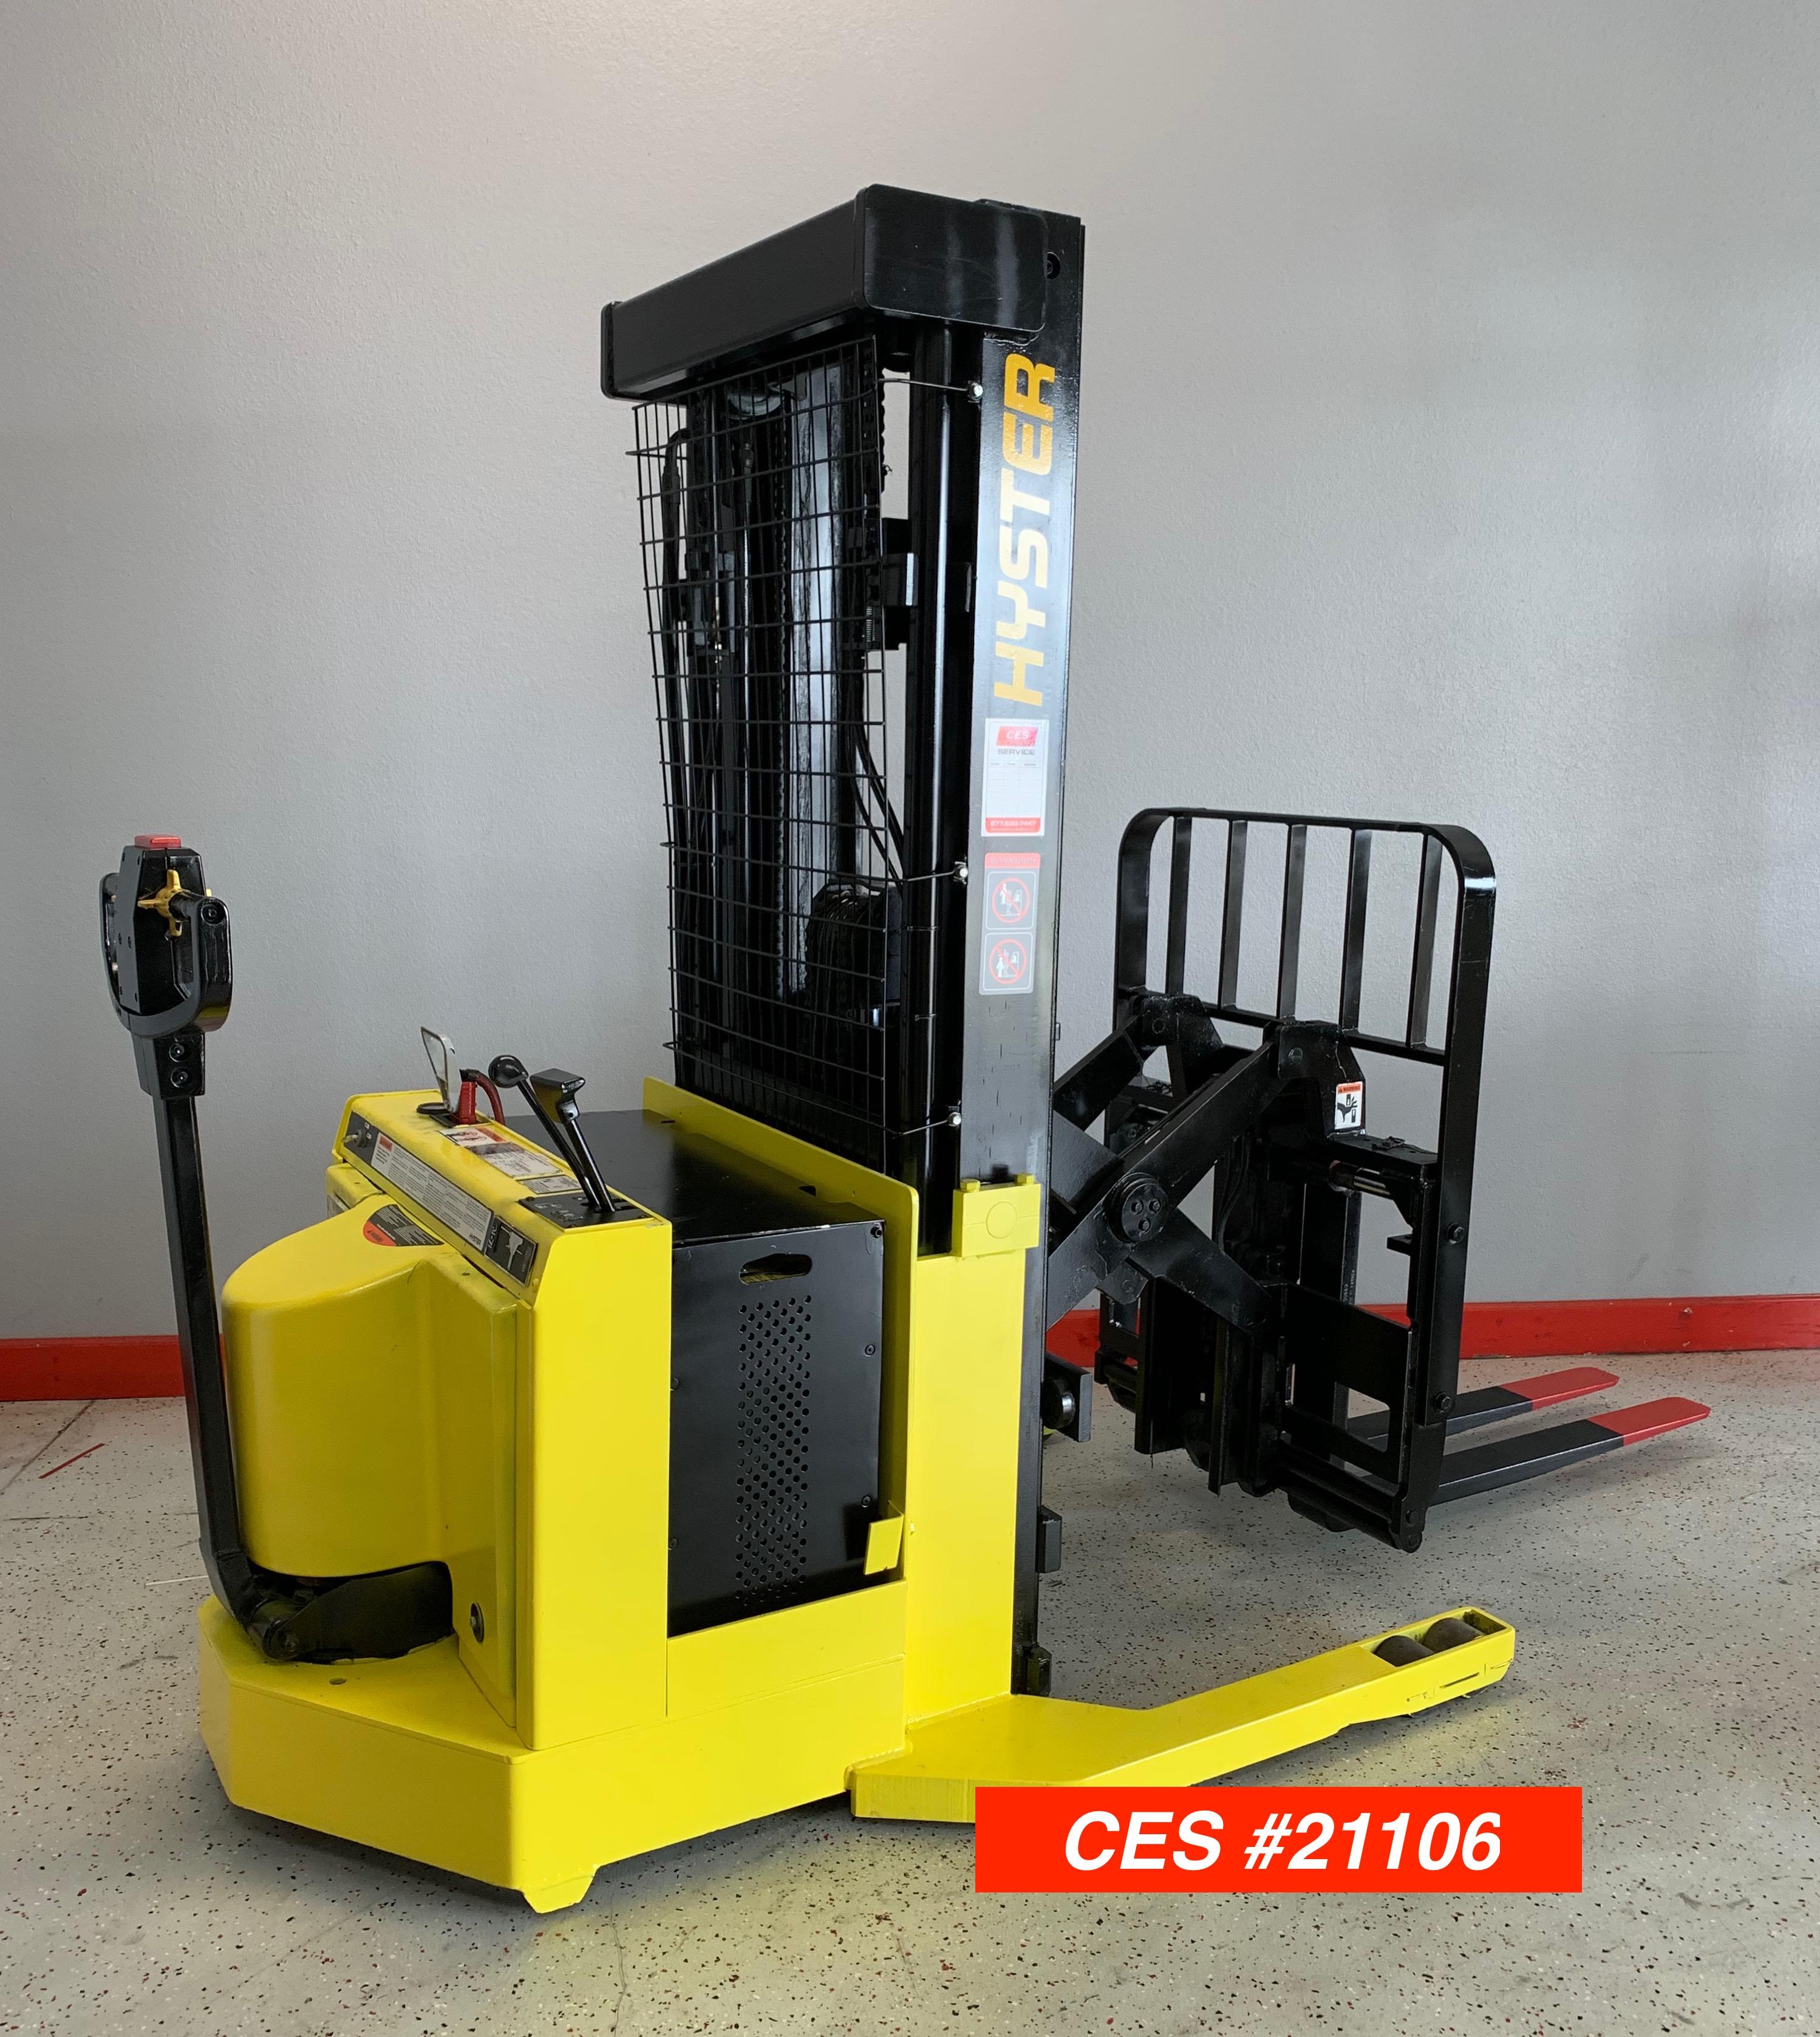 Ces 21106 Hyster W30xtr Walkie Reach Stacker Forklift